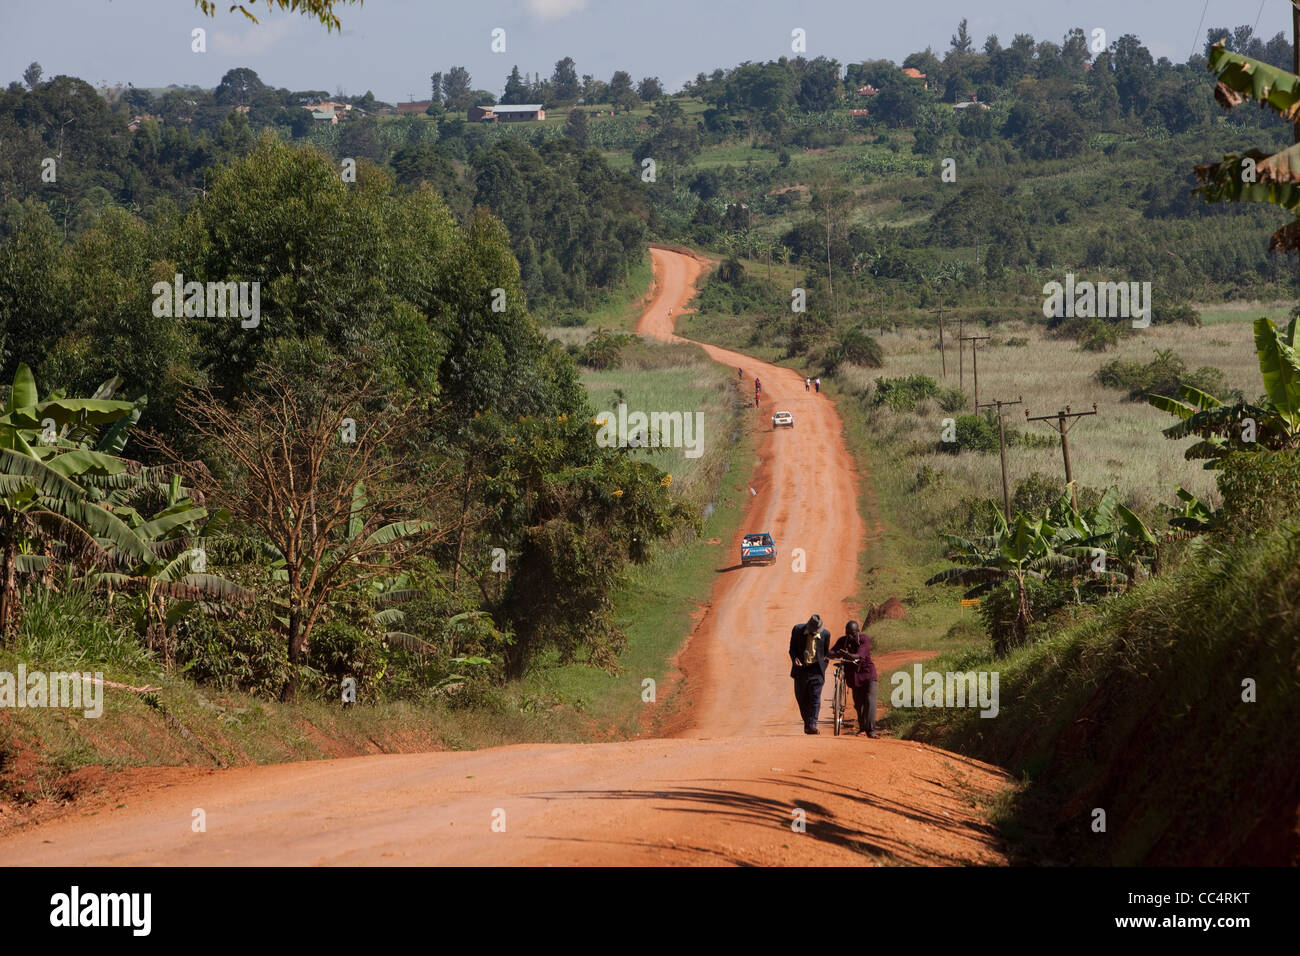 Kawoko town, Masaka District, Uganda PSI reproductive health programs 2010 Photo by Jake Lyell - Stock Image